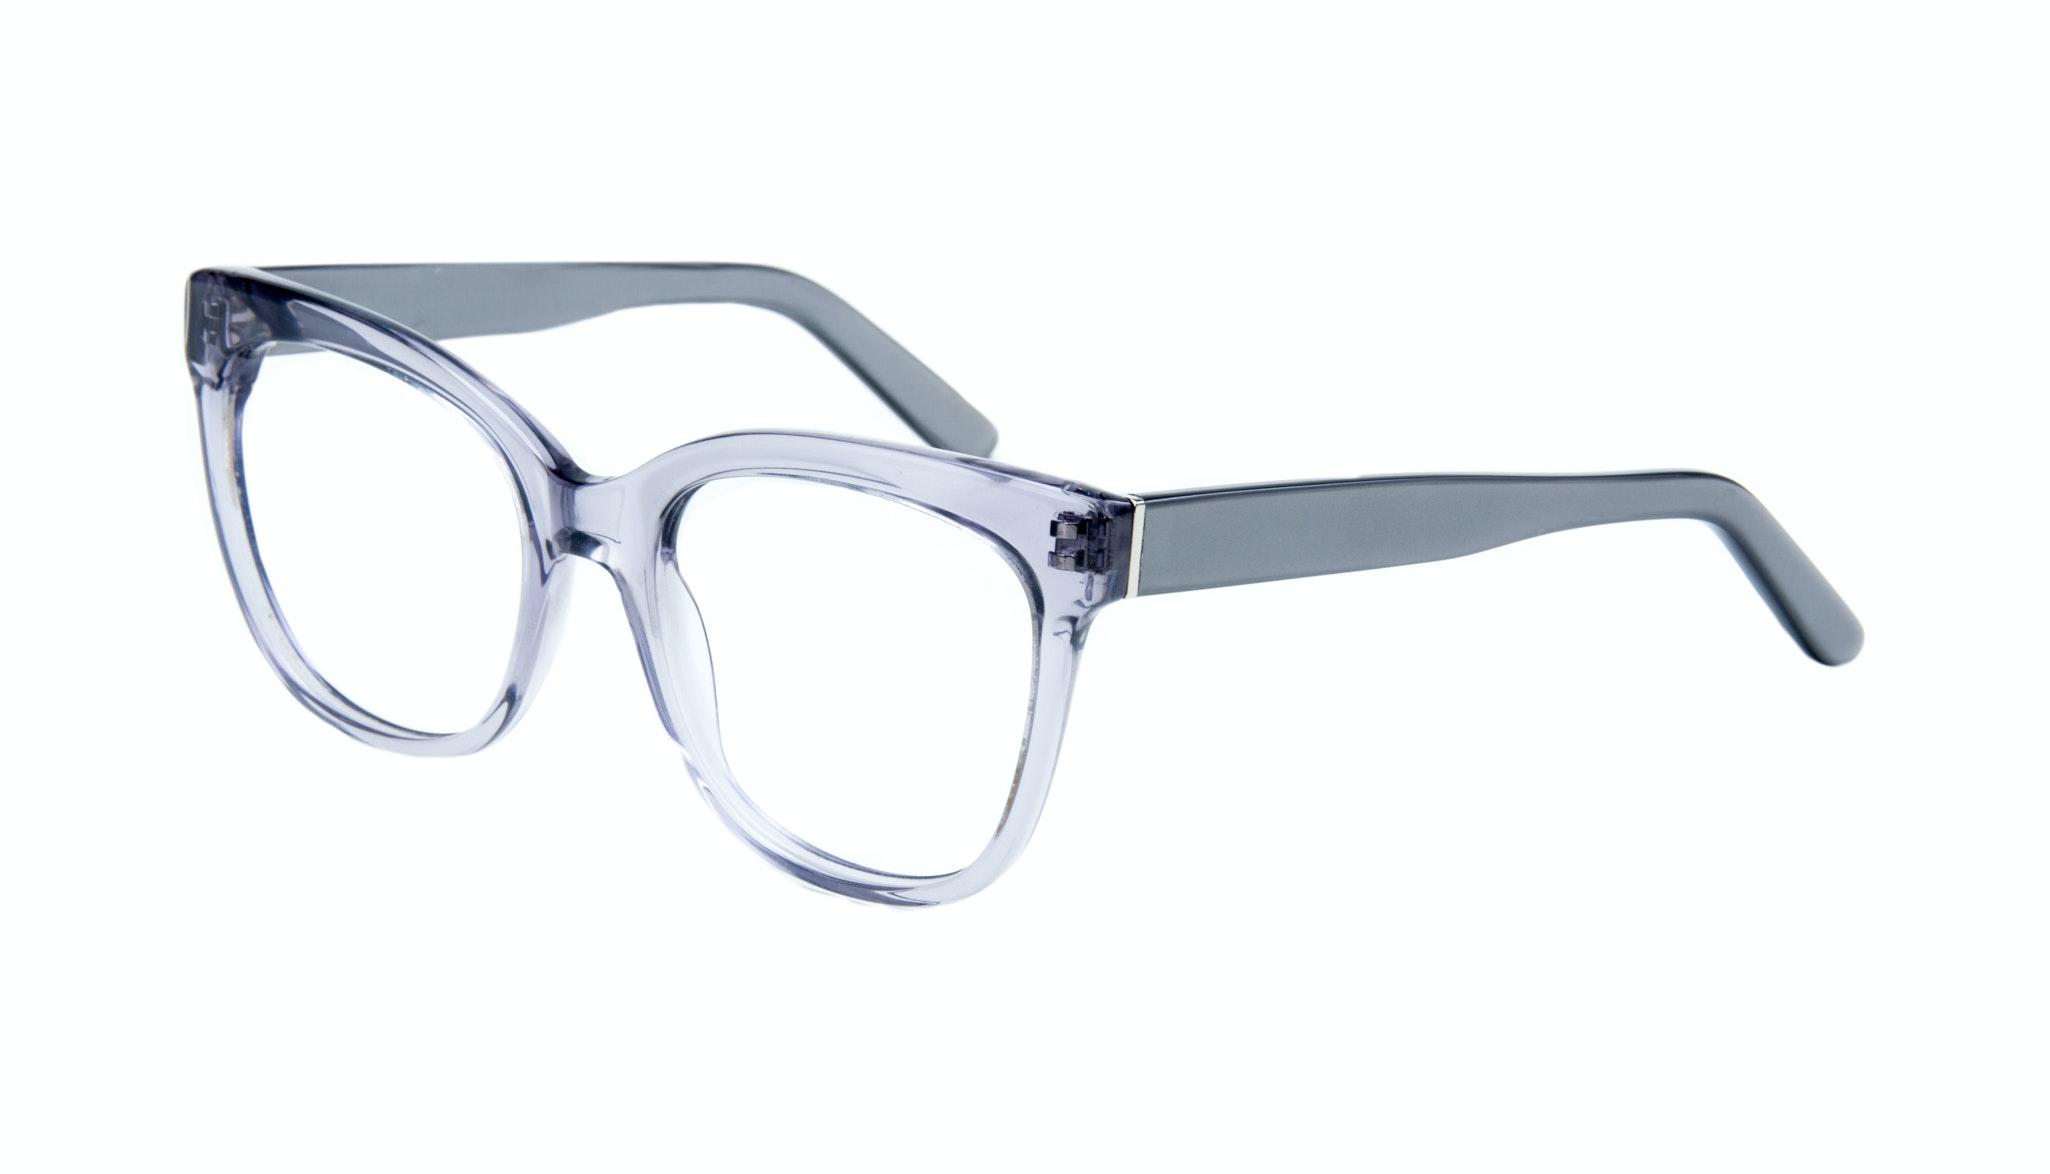 Affordable Fashion Glasses Rectangle Square Eyeglasses Women Breezy Grey Metal Tilt